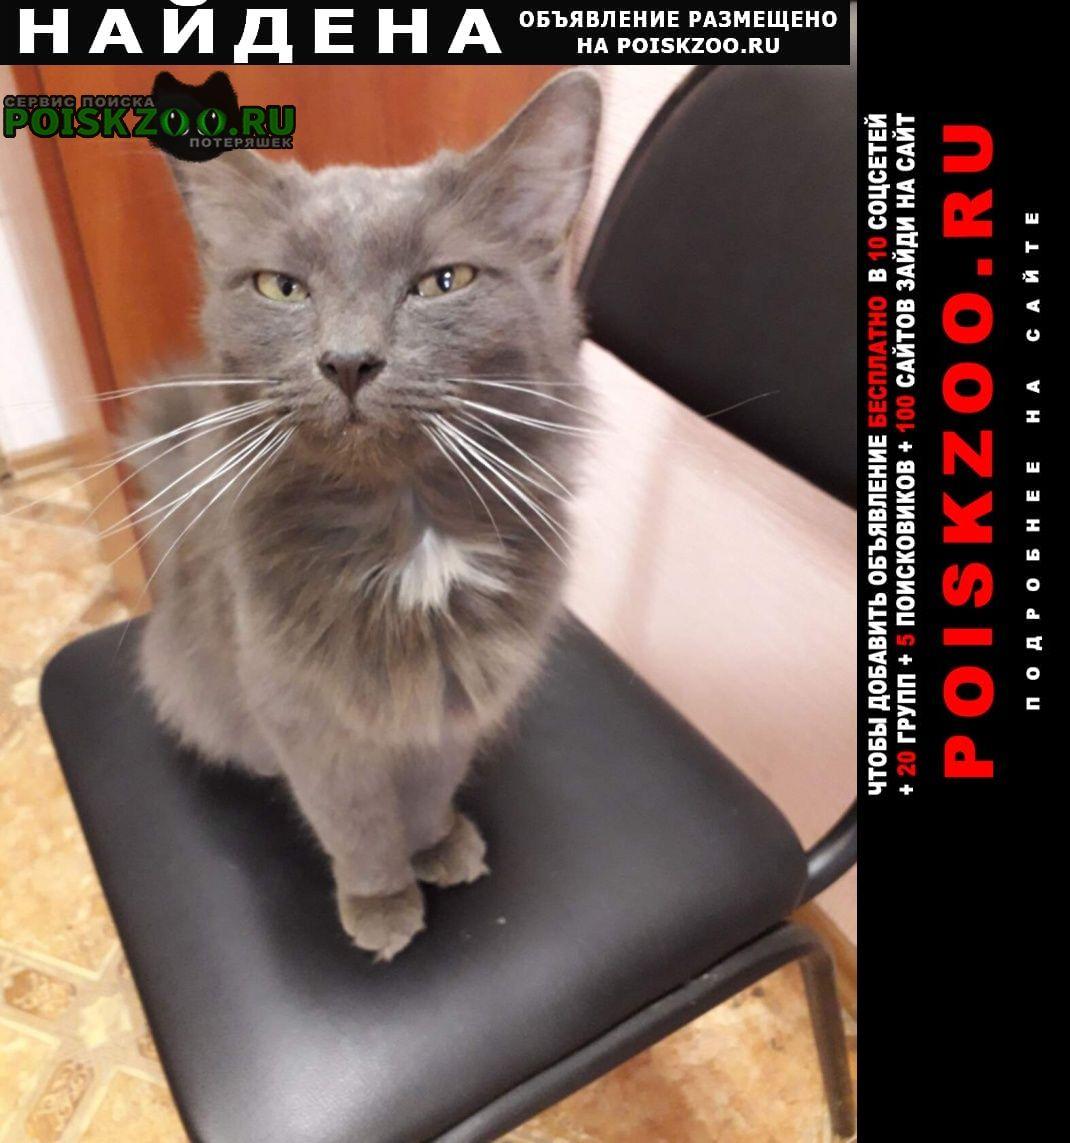 Найдена кошка Кондрово